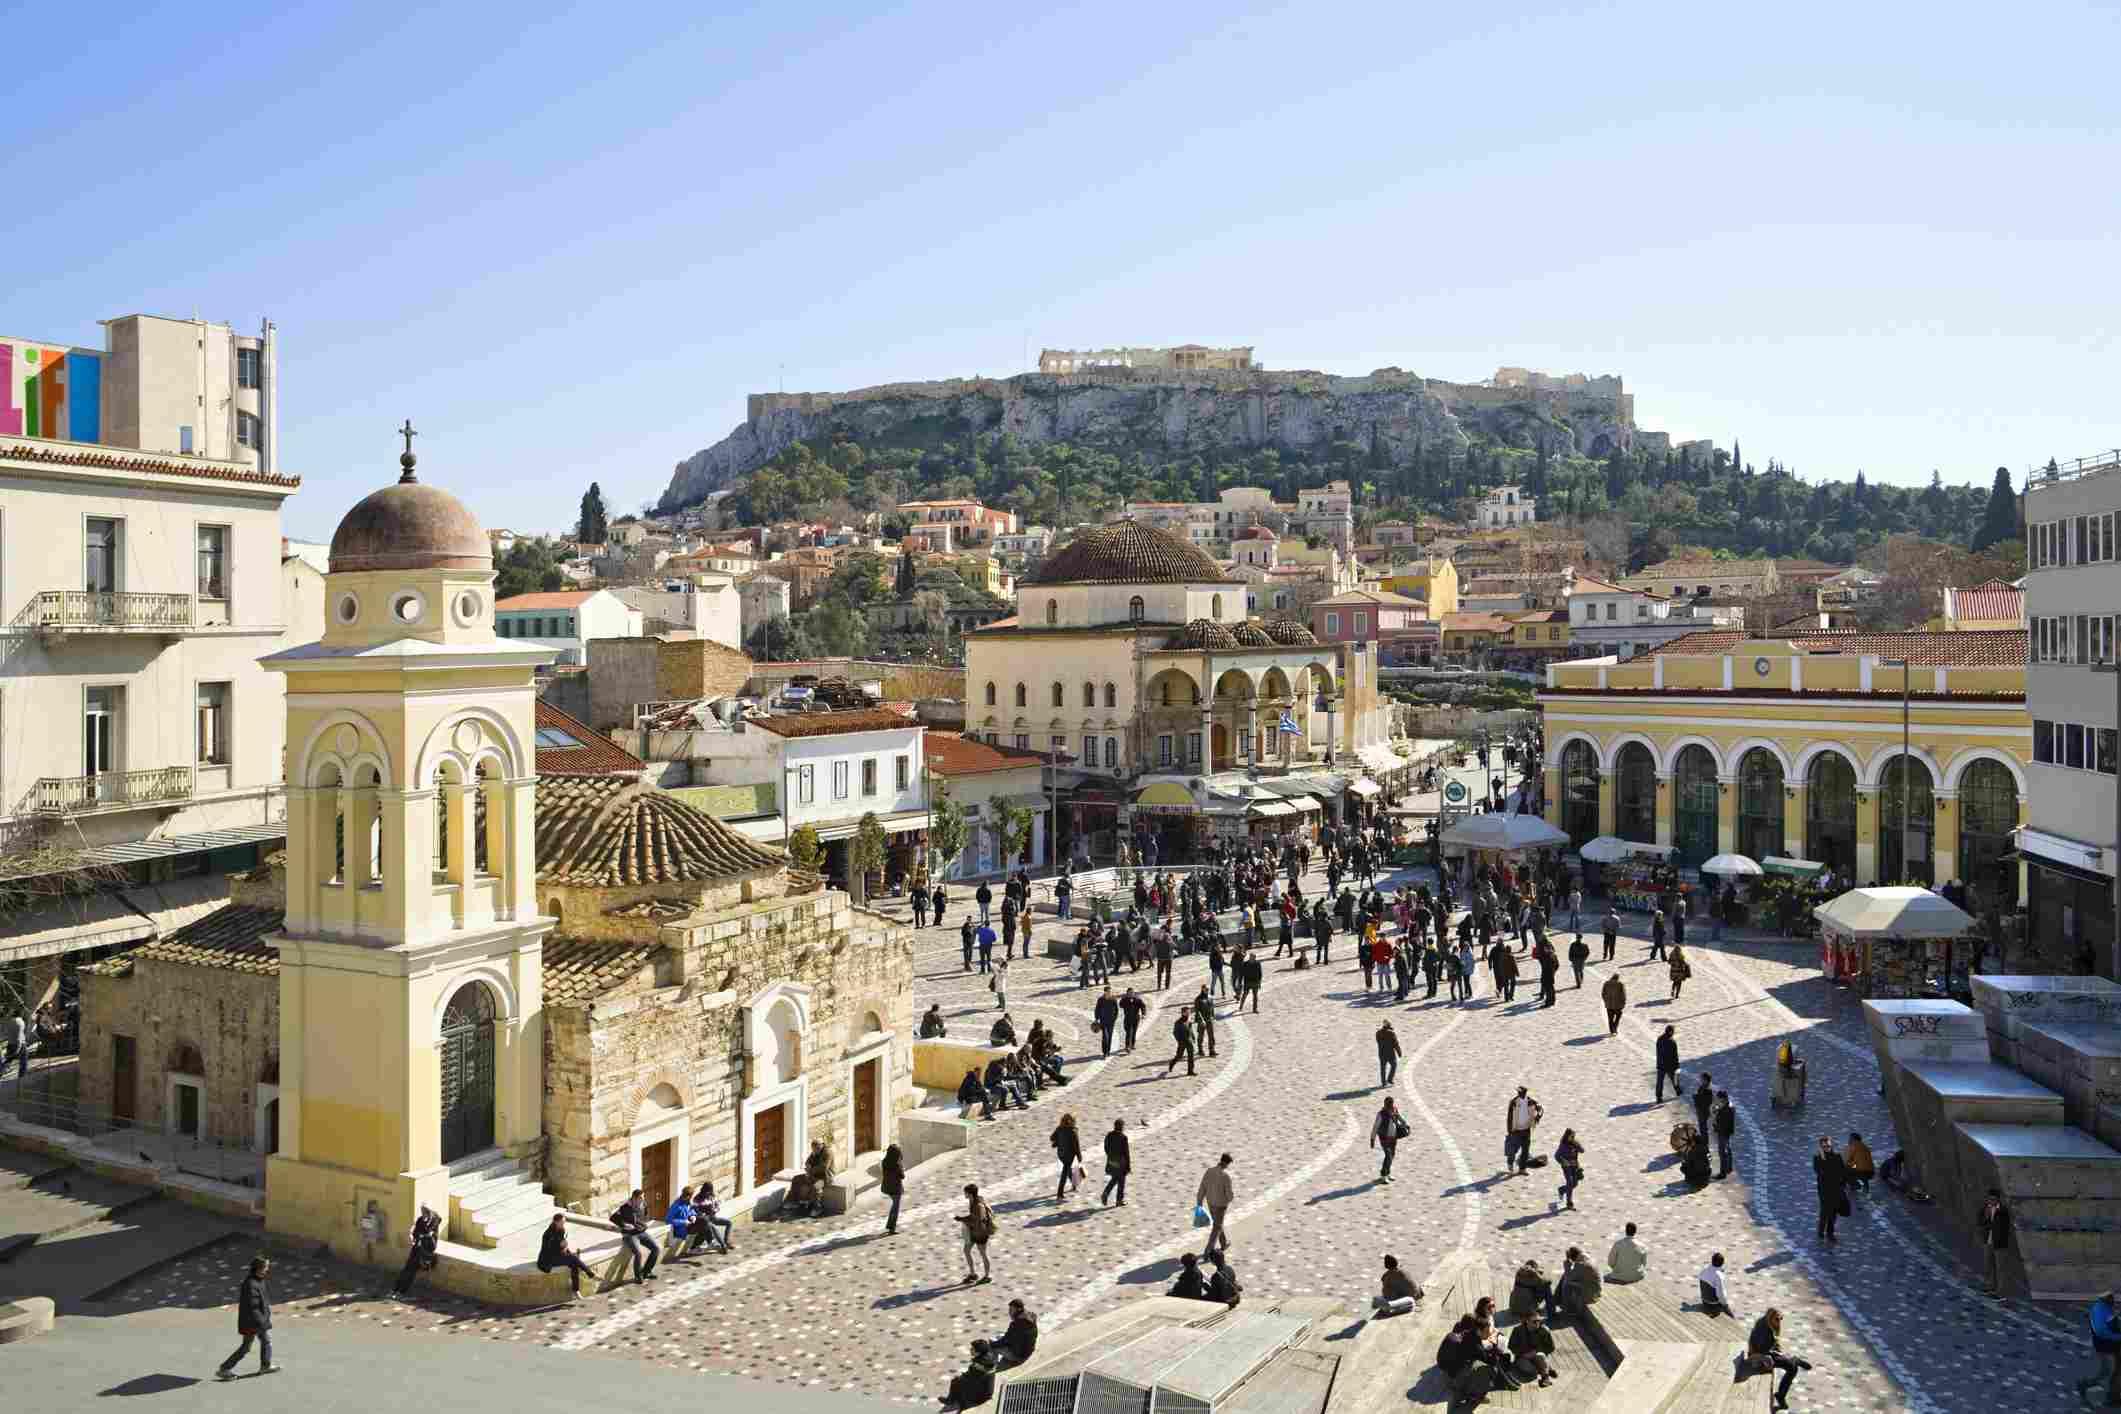 Elevated view of Monastiraki Square in Athens, Greece